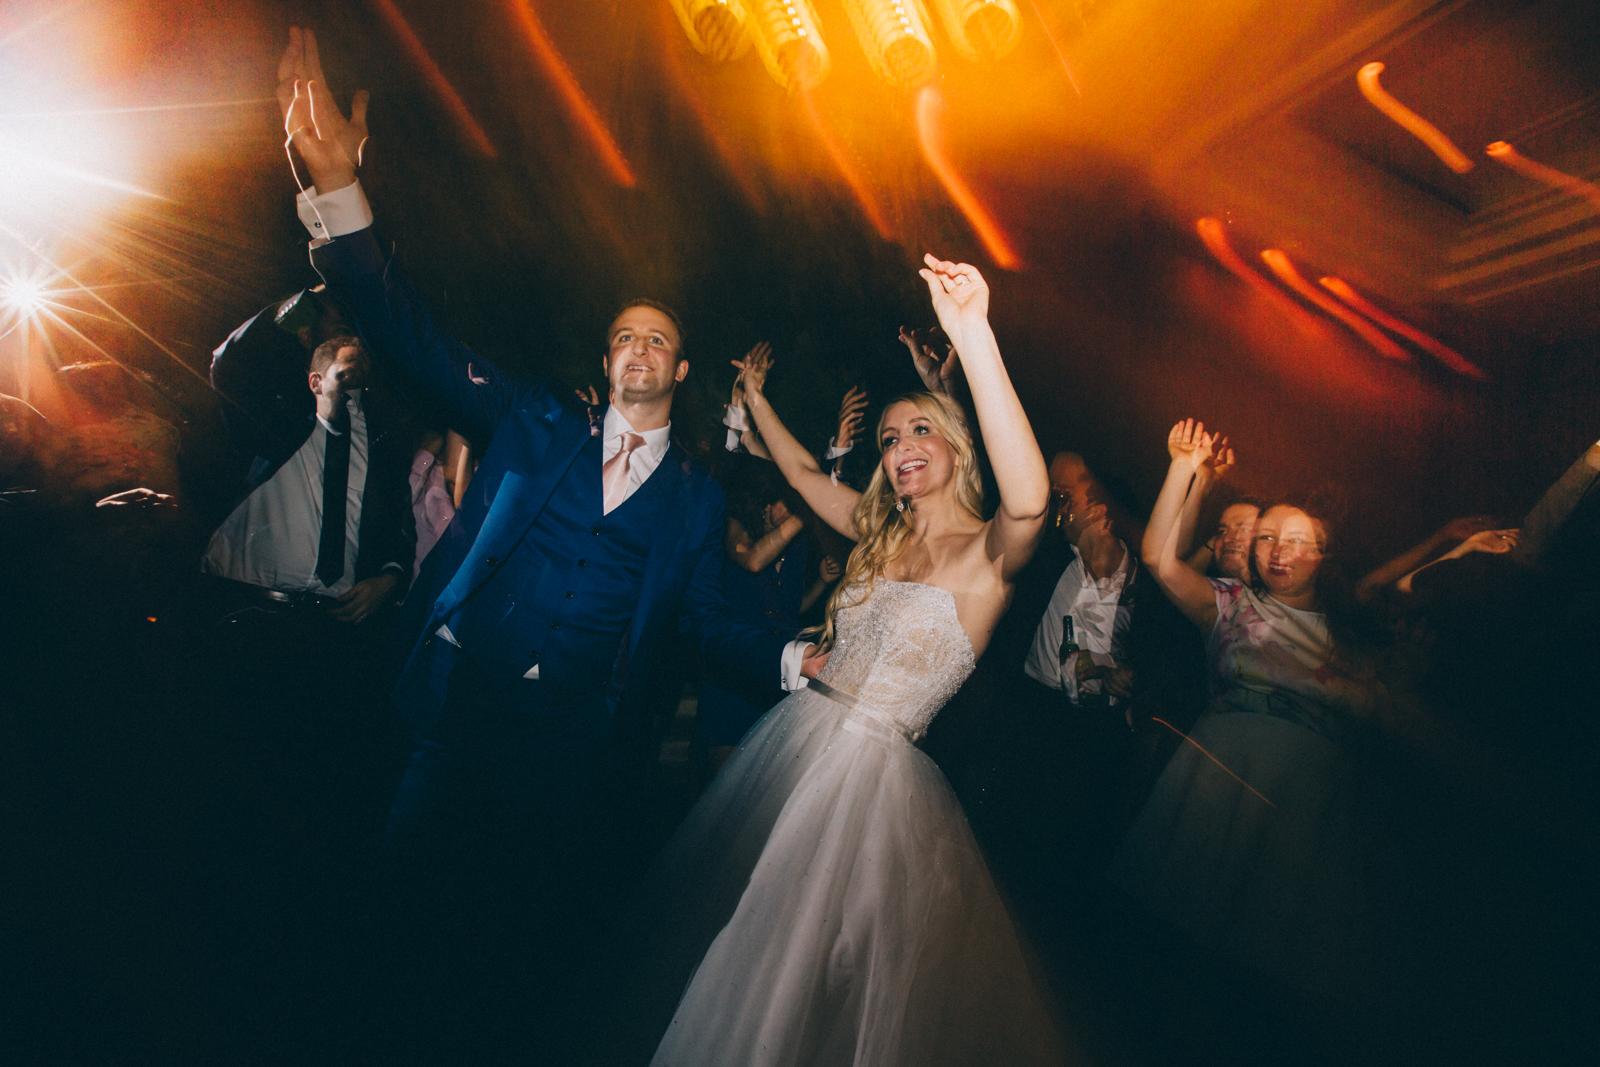 NYC Wedding Photography Sofitel Central Park Brooklyn Photographer Boris Zaretsky _B2C3117.jpg